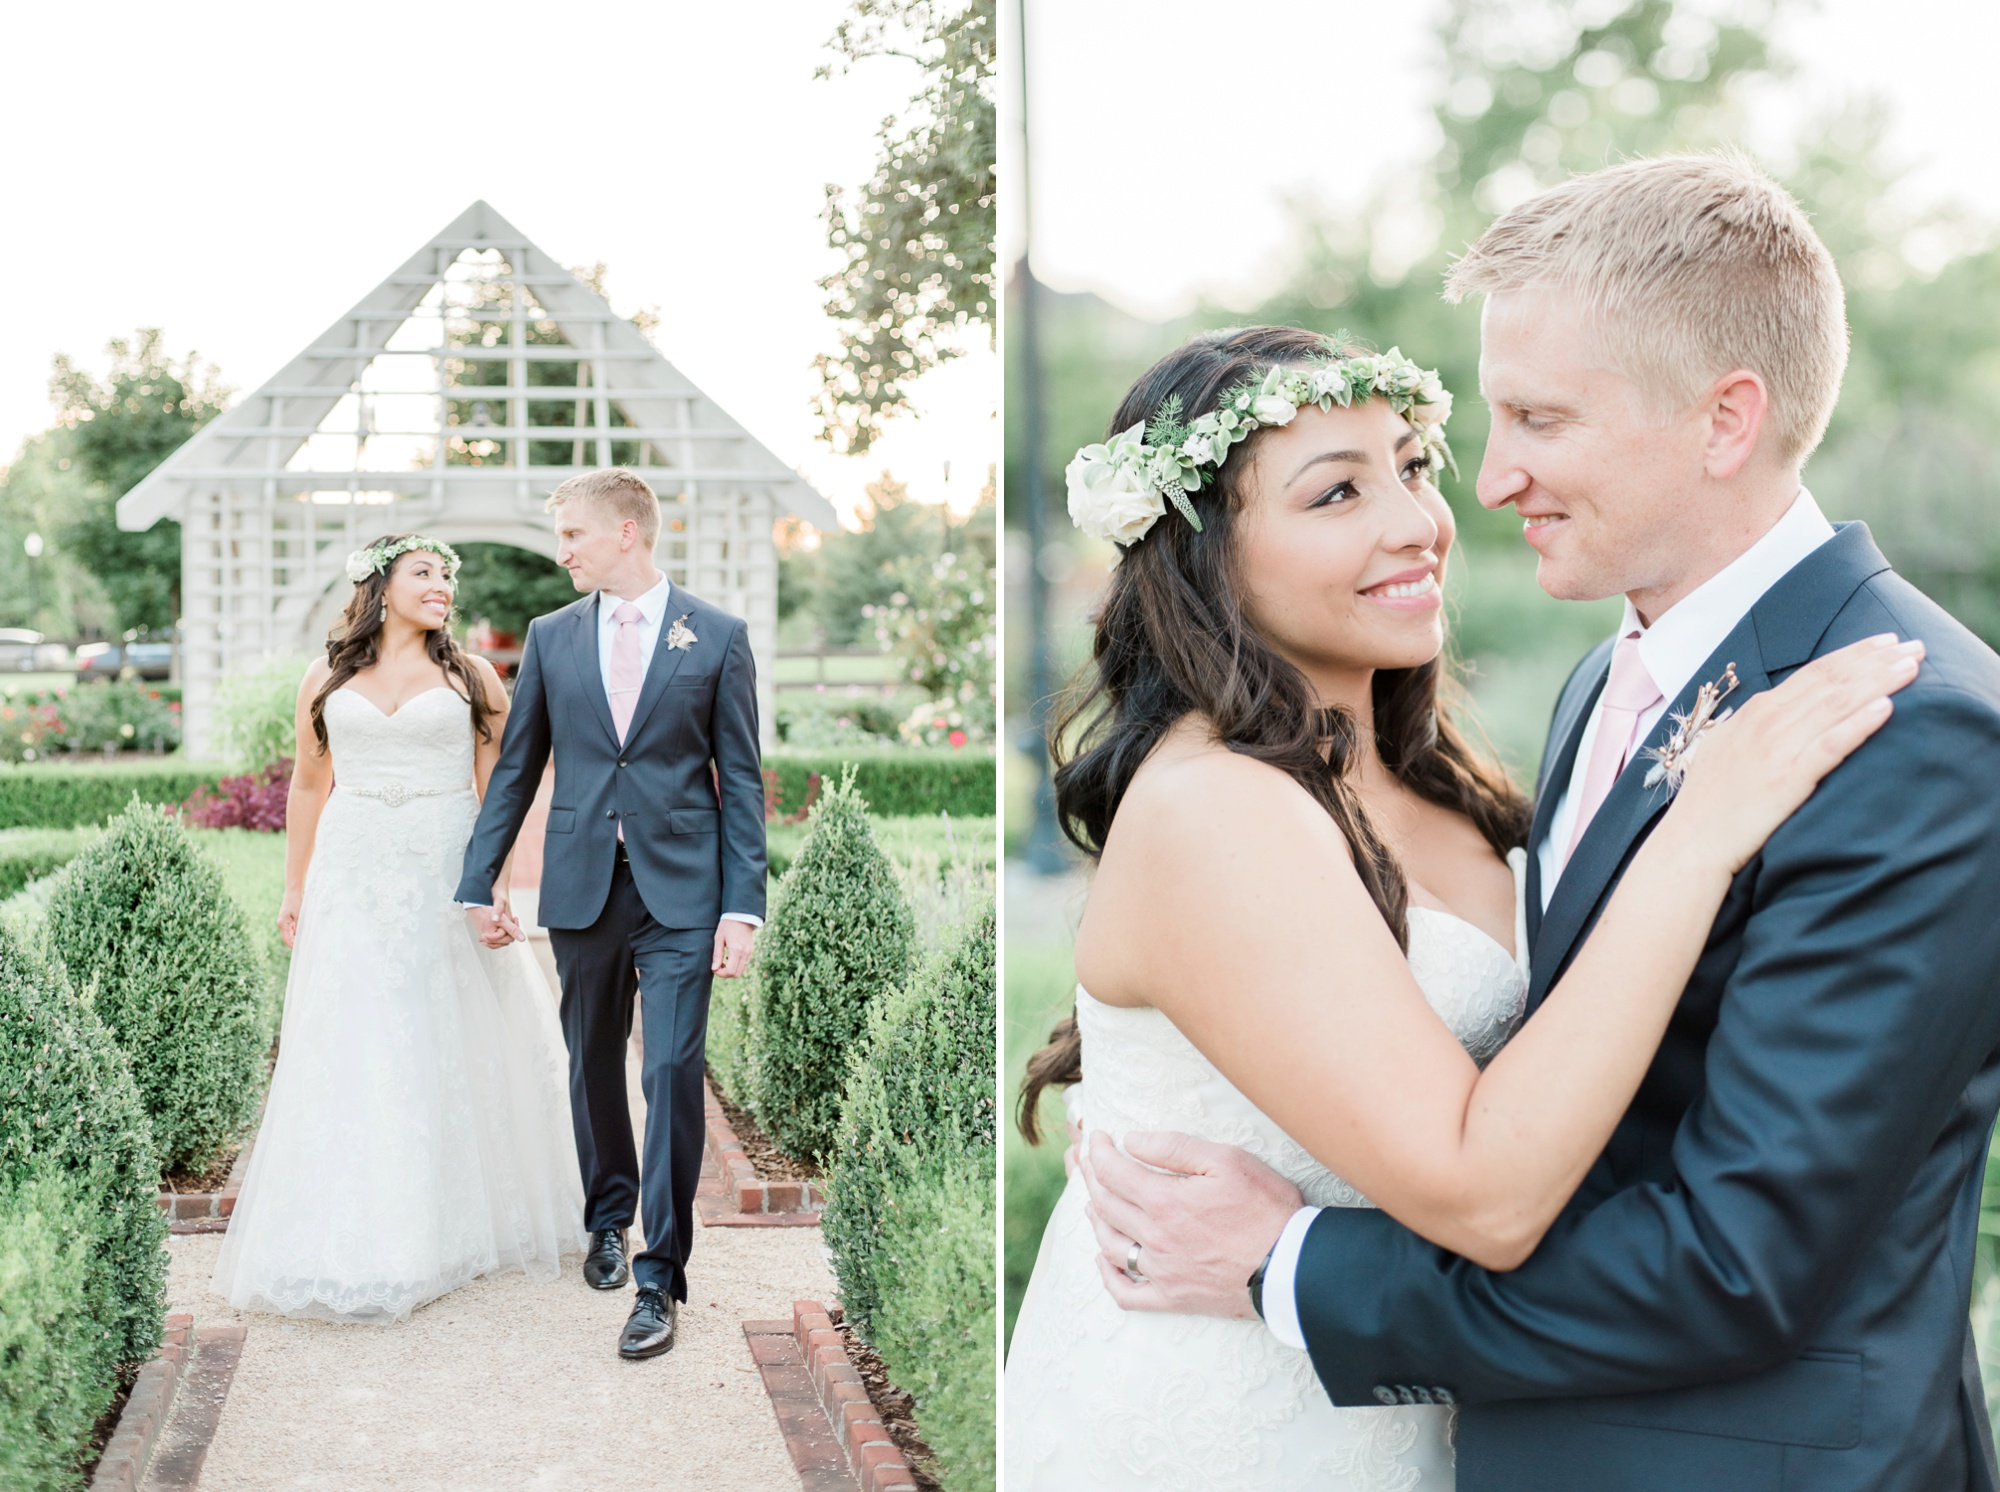 wells-barn-wedding-at-franklin-park-conservatory-117.jpg